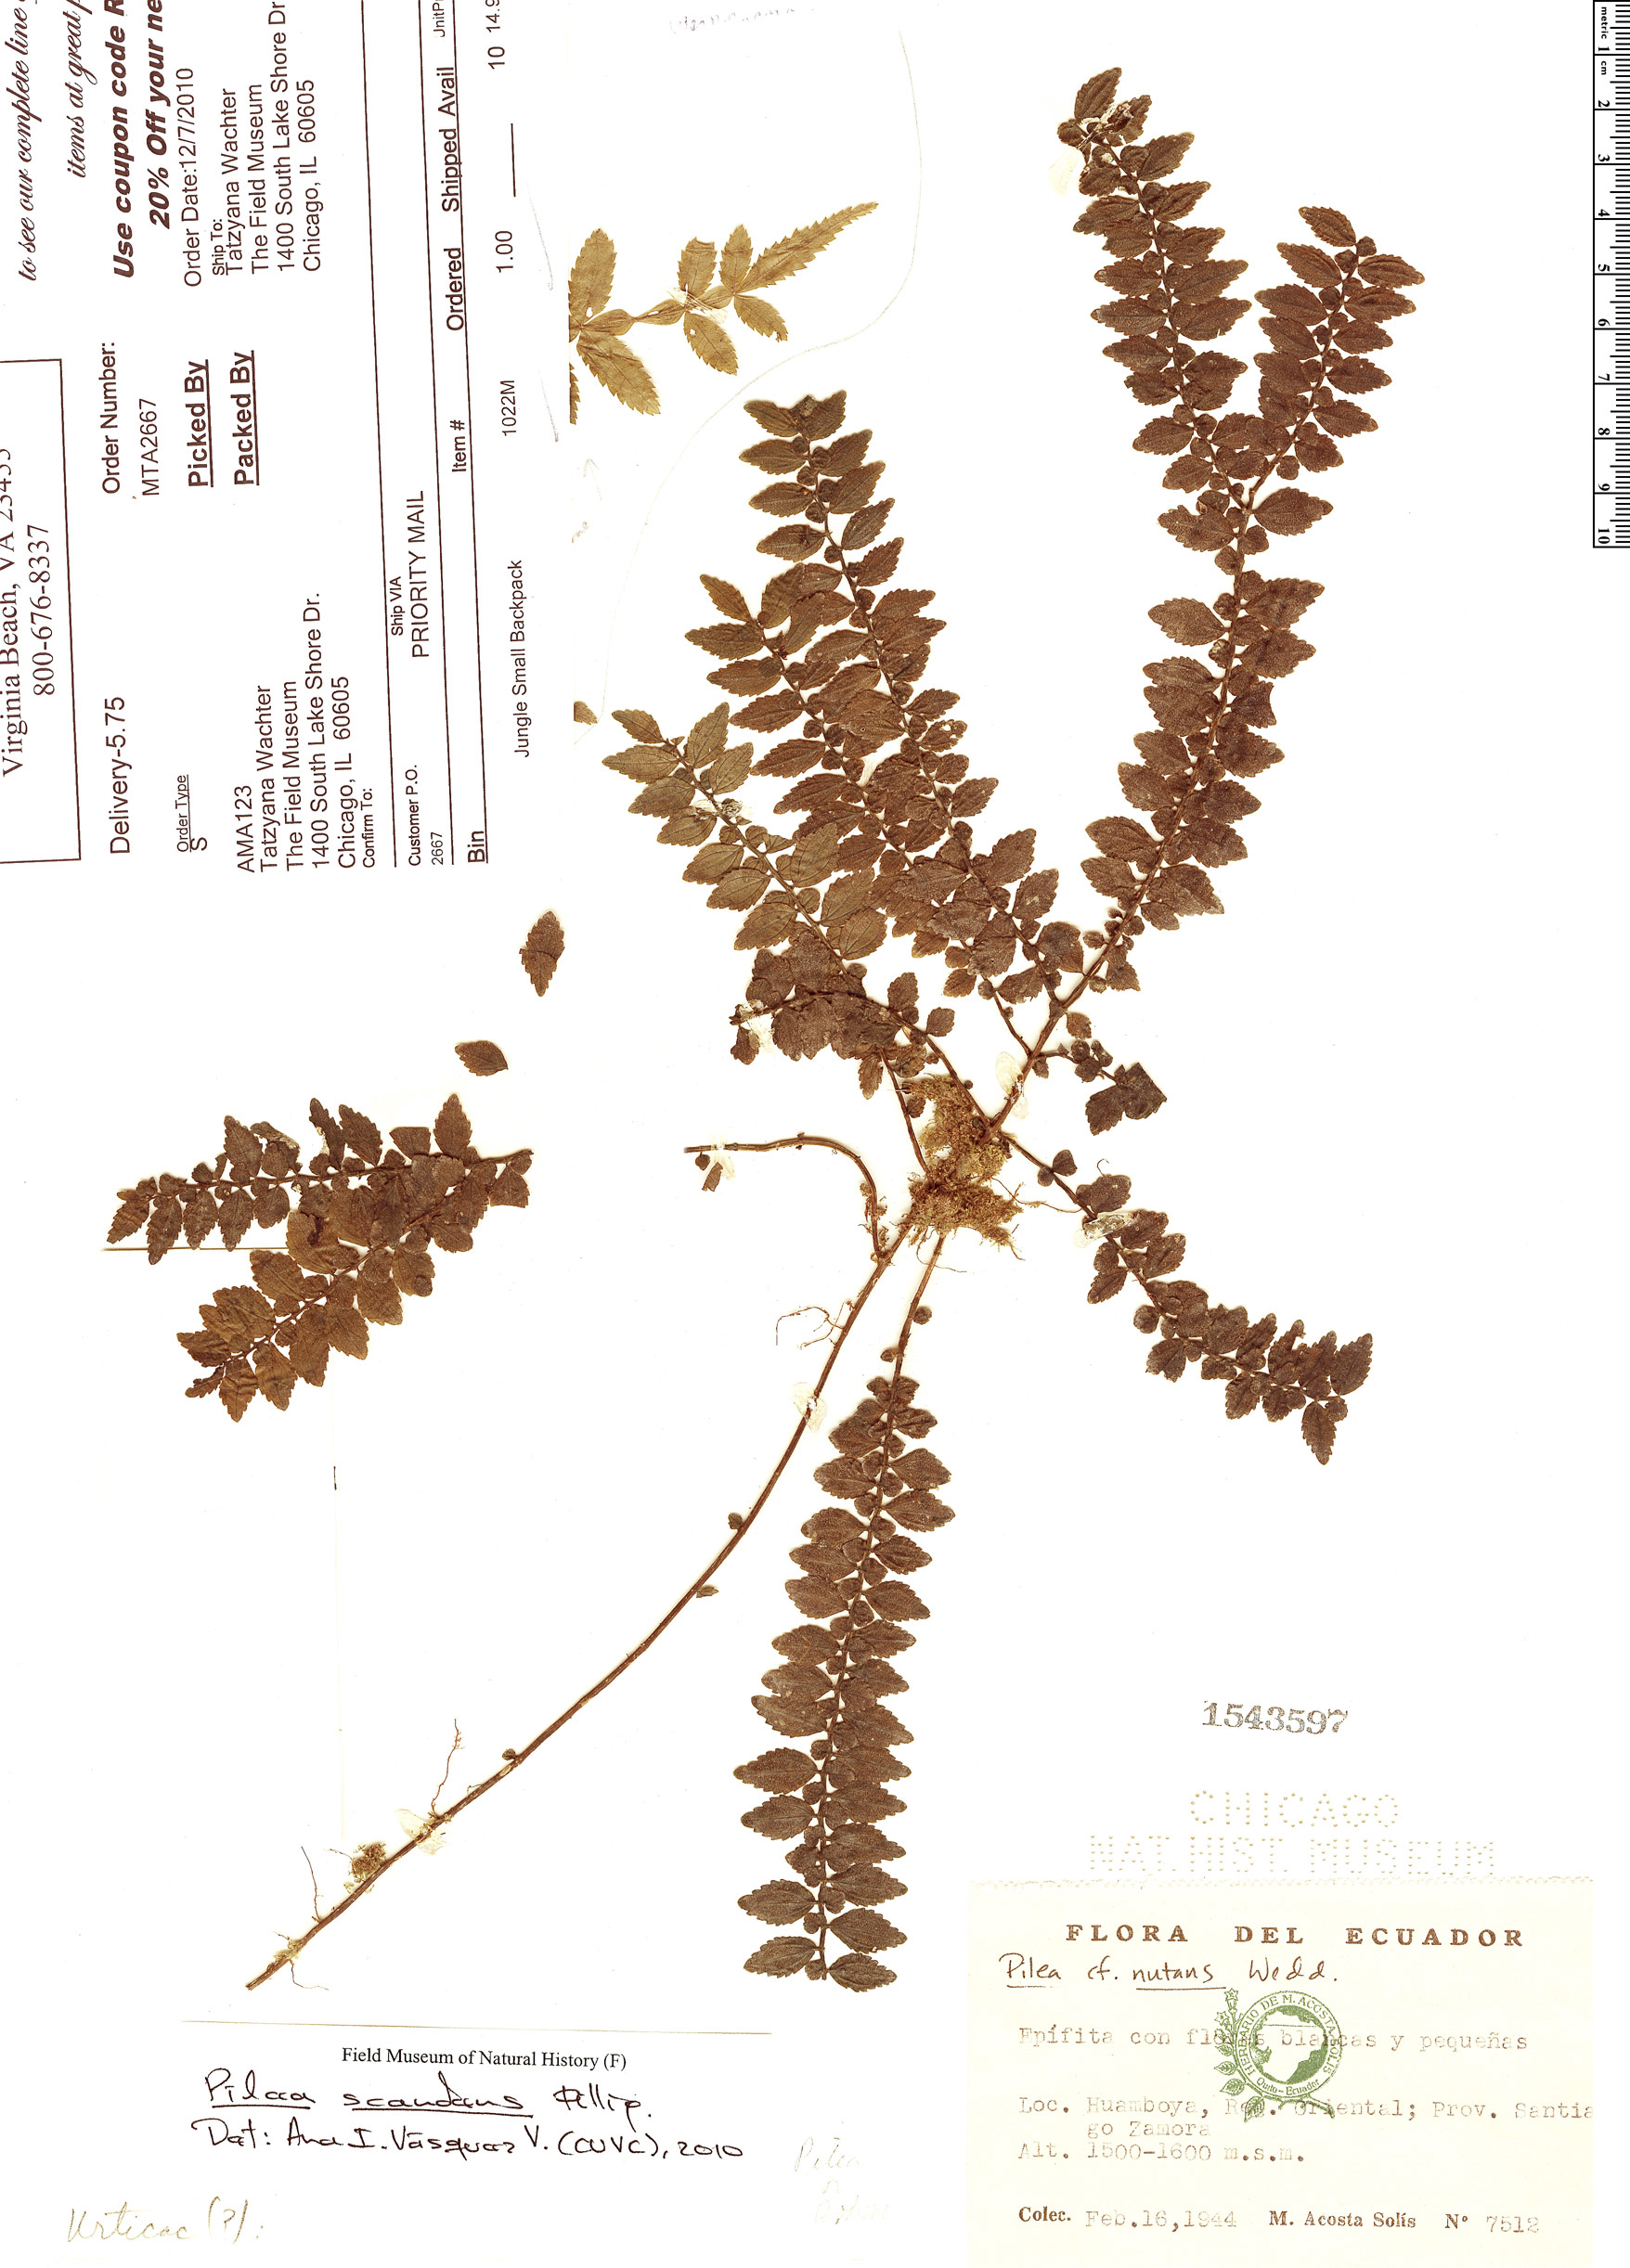 Specimen: Pilea scandens